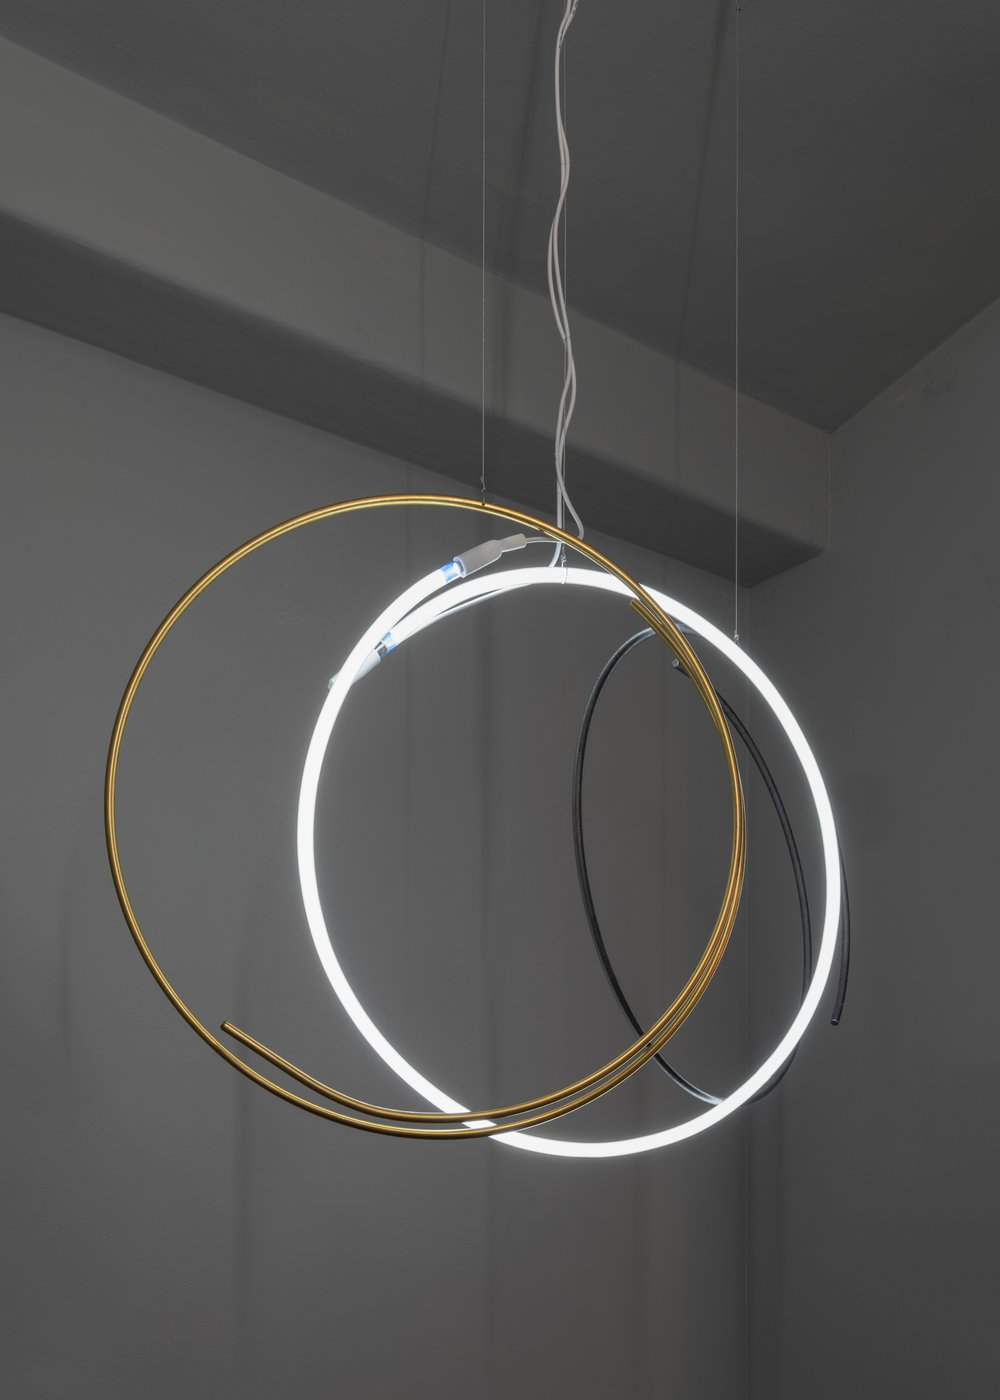 CERCLES LAITON, 2019 60 x 80 x 60 cm Steel, brass, neon